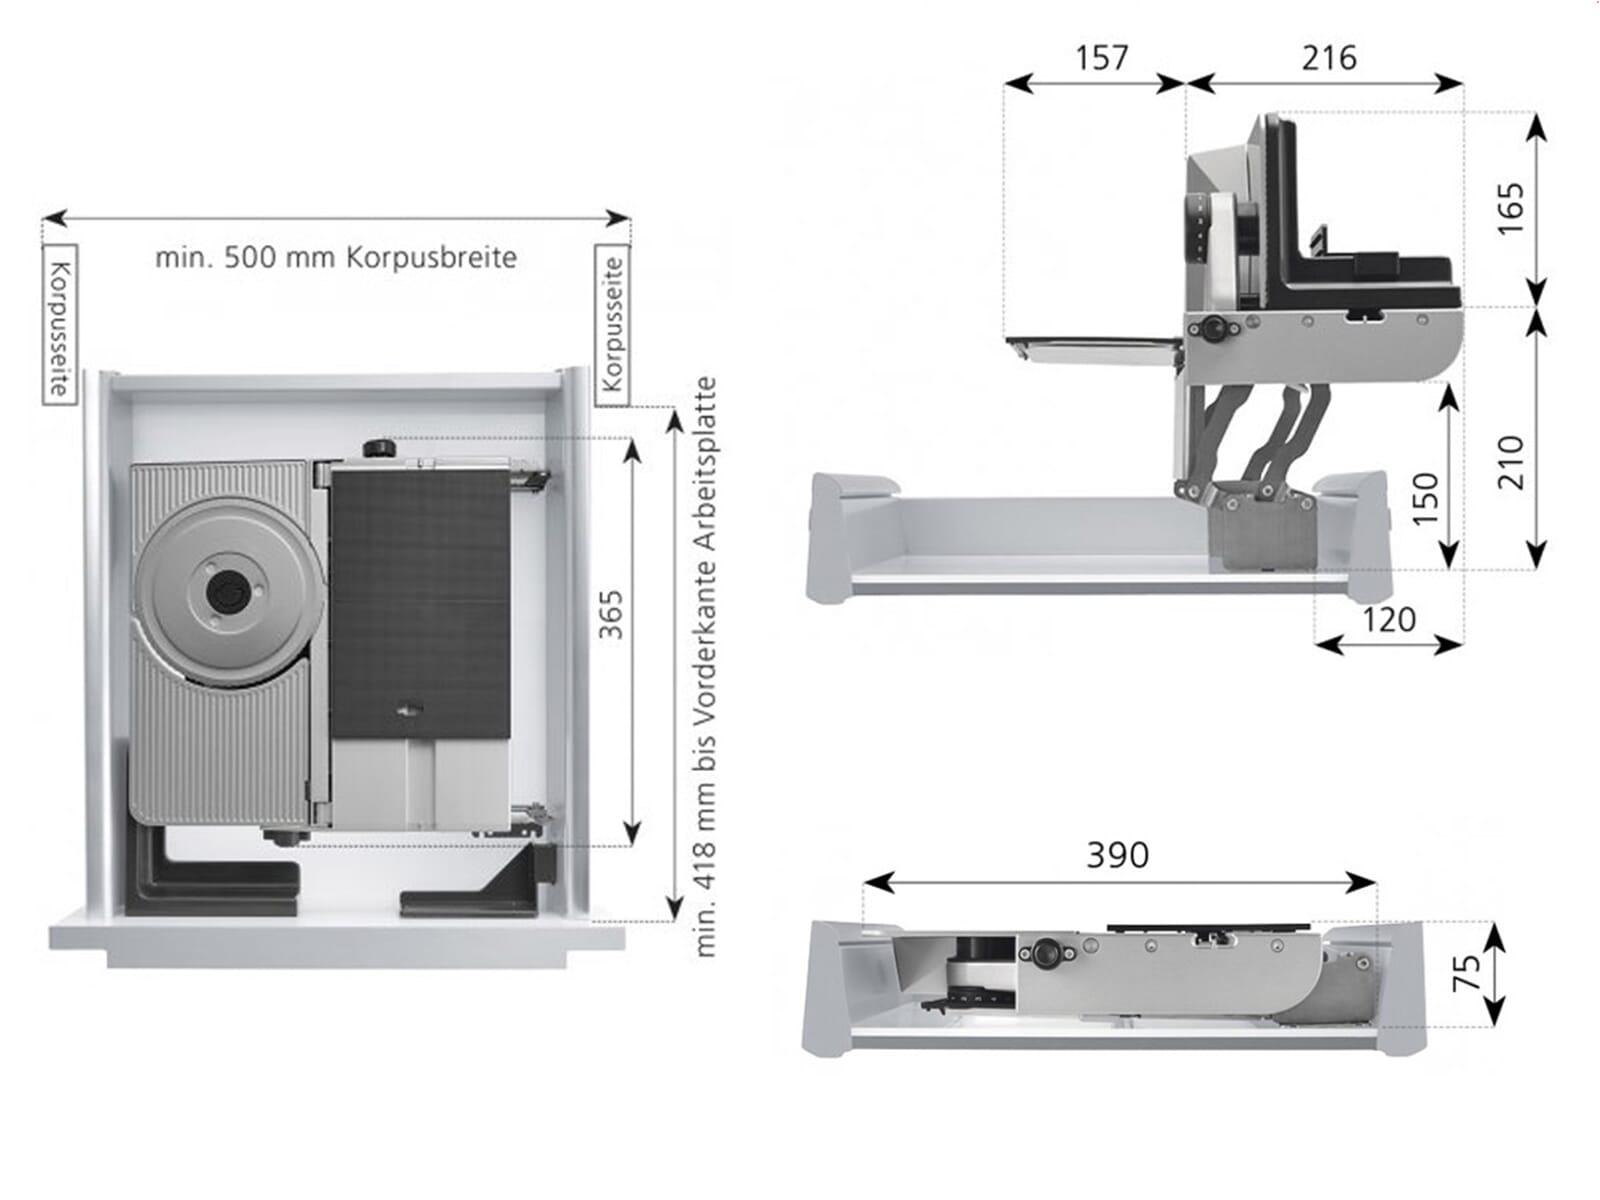 ritter aes 72 sr h multi schneider silbermetallic. Black Bedroom Furniture Sets. Home Design Ideas